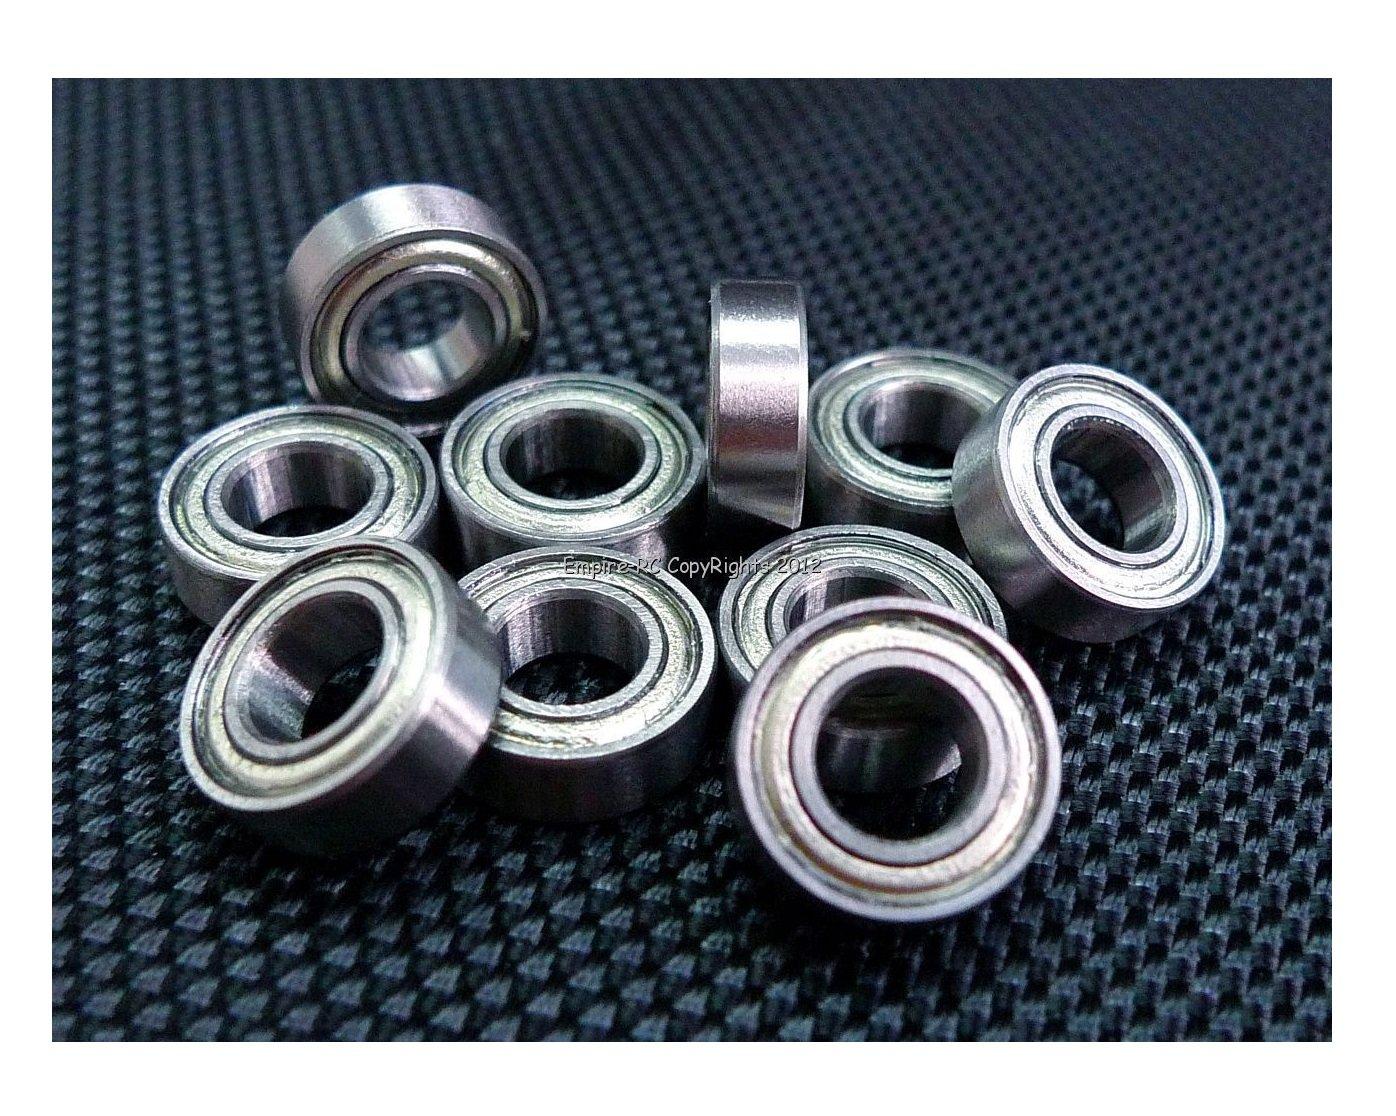 (10 PCS) MR126ZZ (6x12x4 mm) Metal Shielded Ball Bearing Bearings MR126z